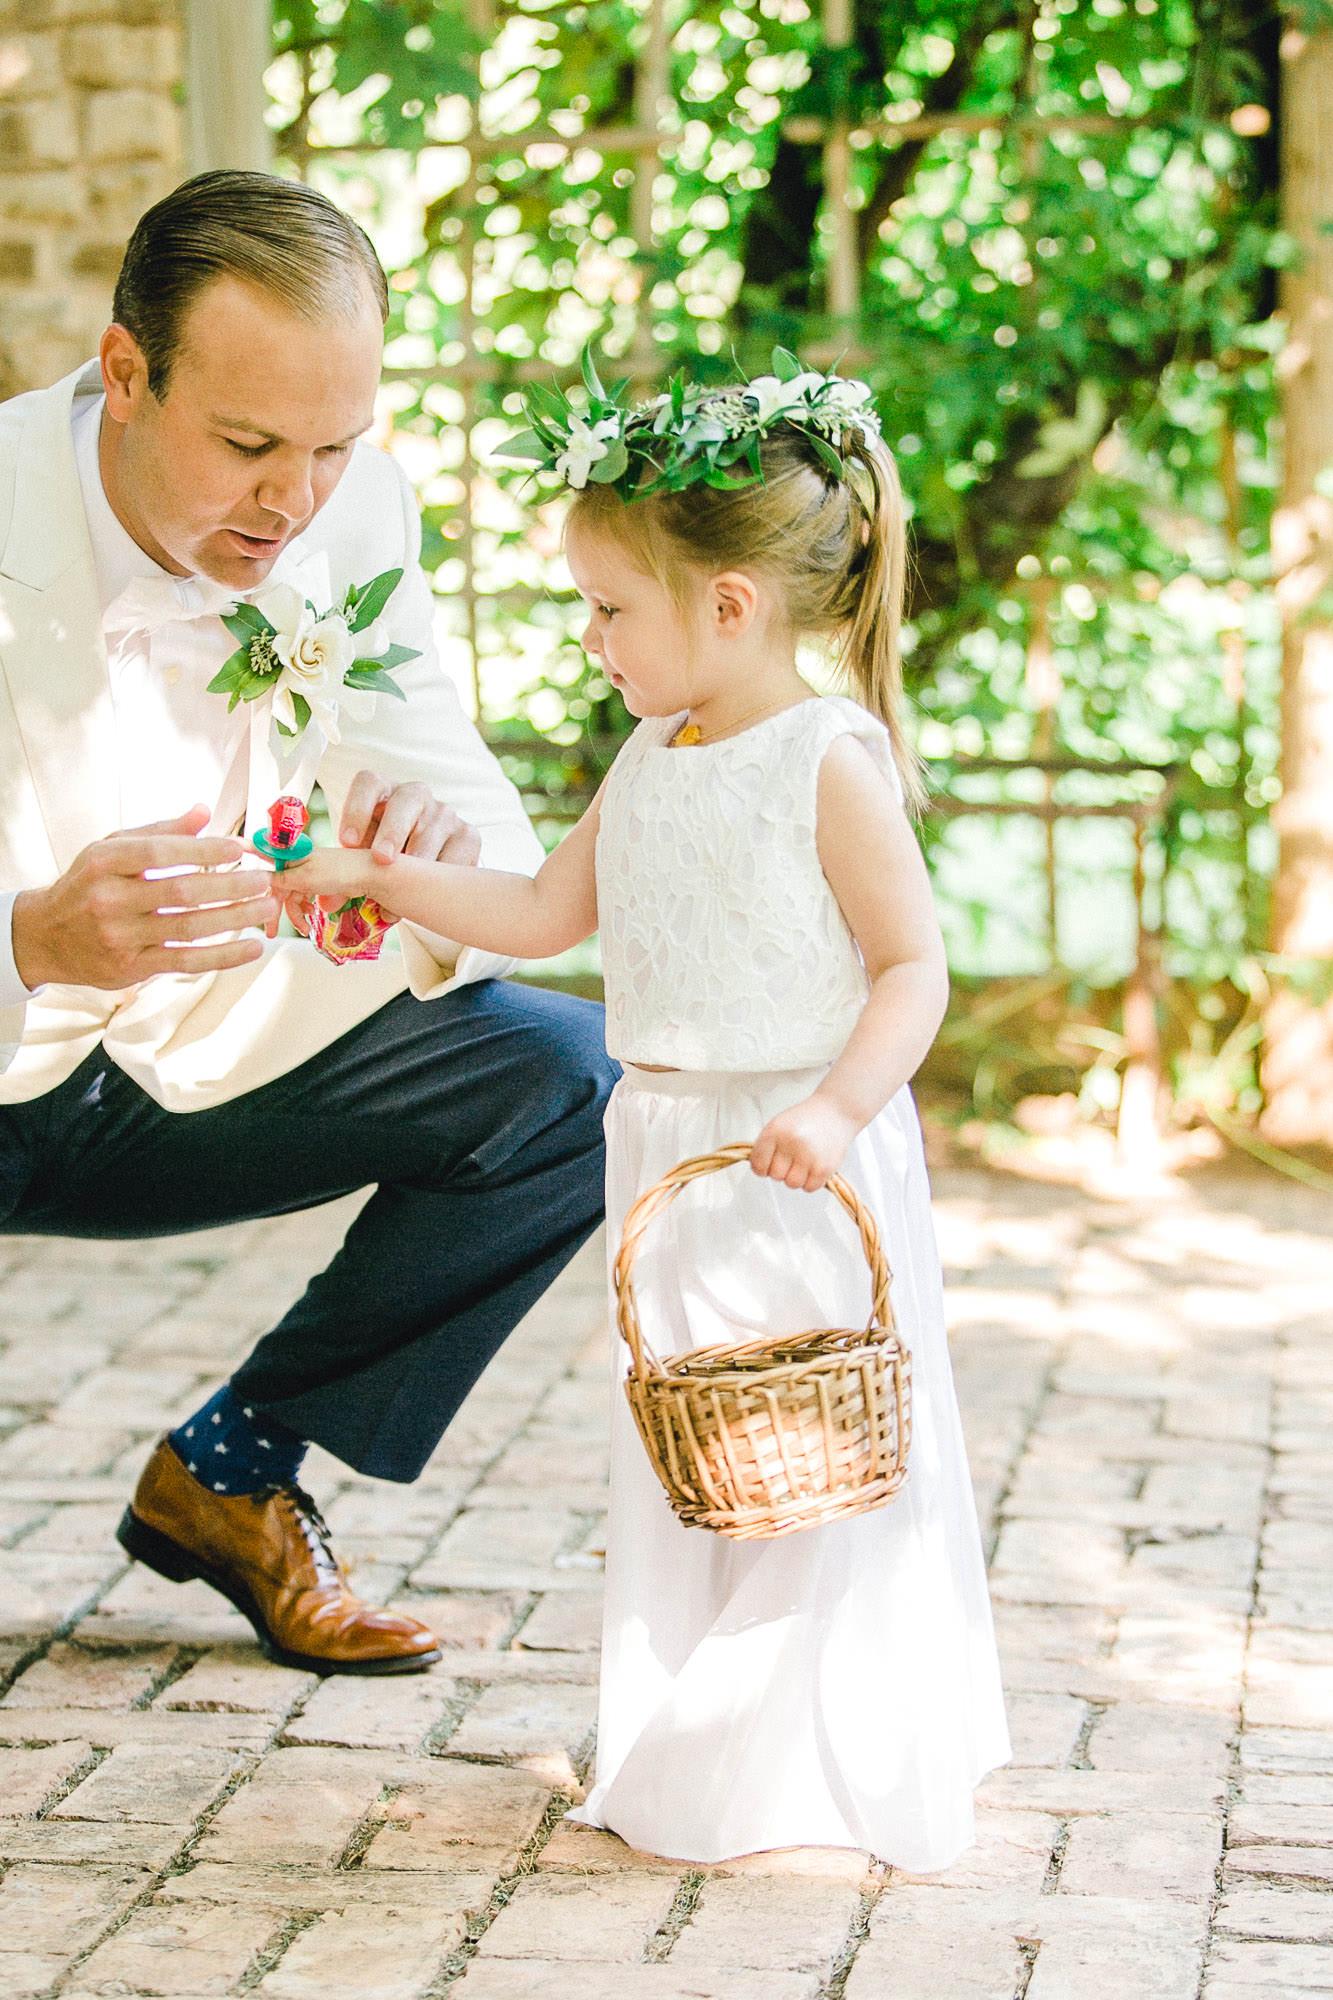 ali-brandon-hamilton-lubbock-wedding-photographer-estate-lee-lewis-construction-bee-alleej_0054.jpg